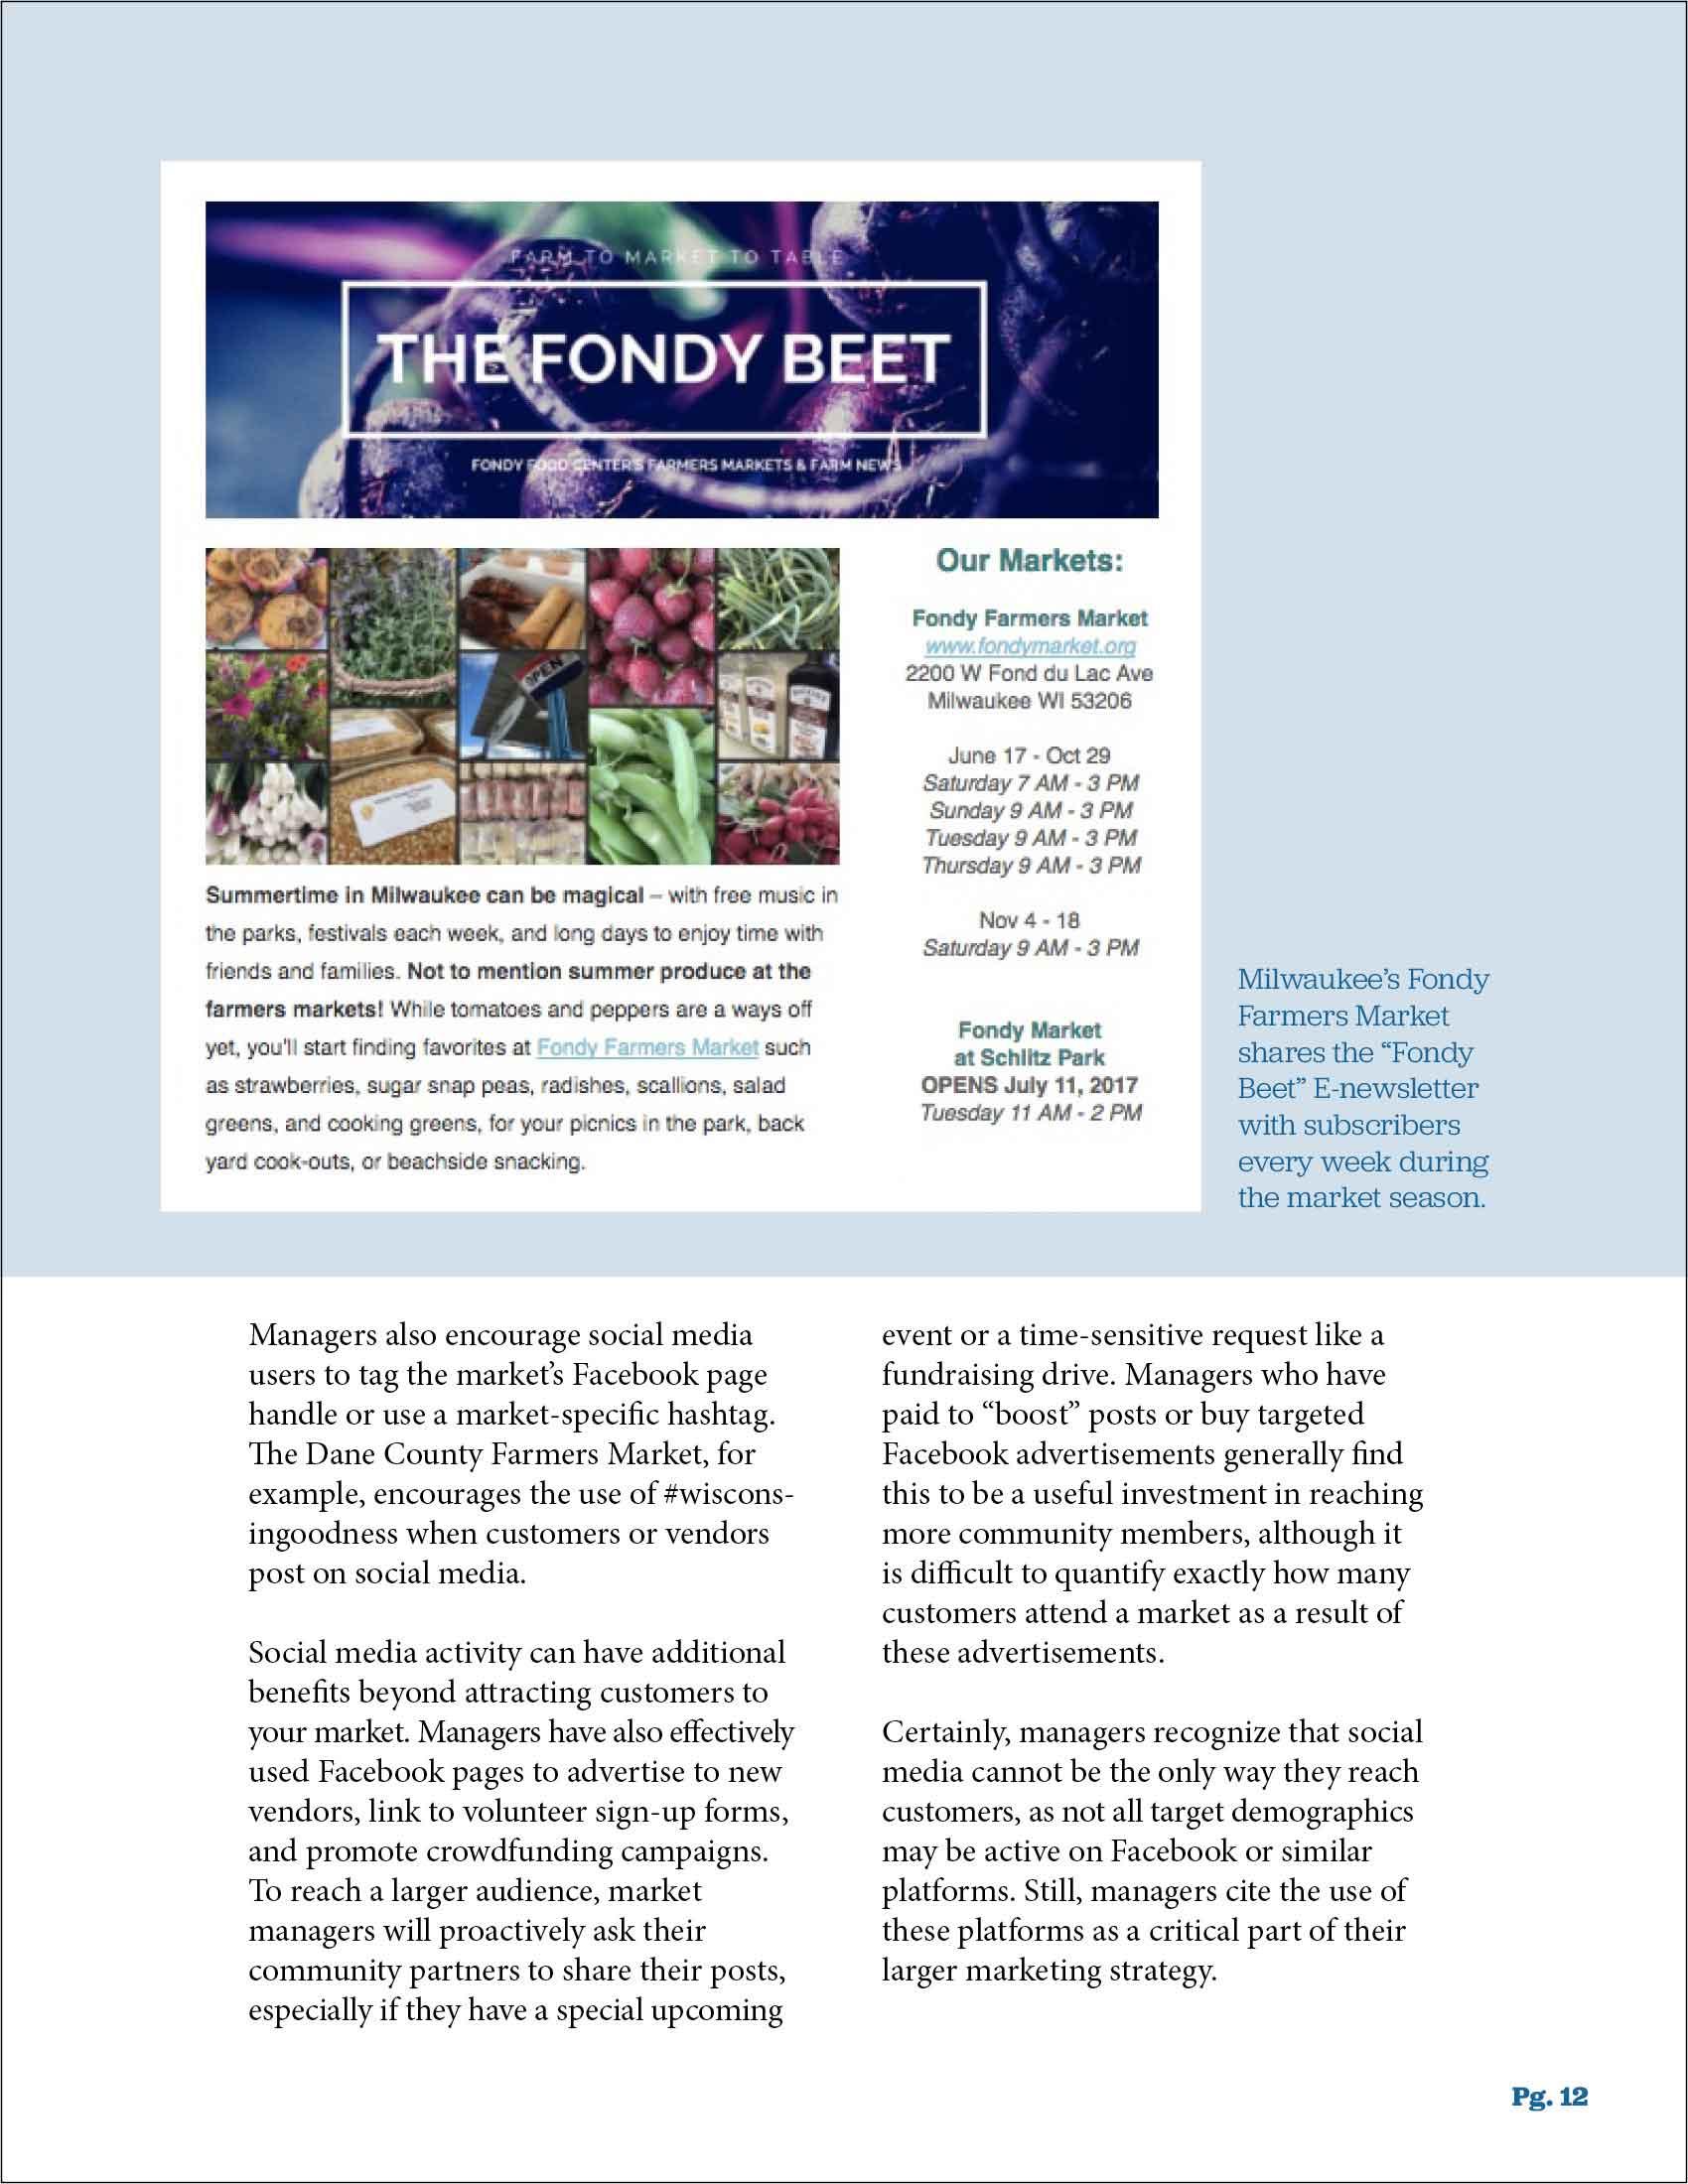 FarmersMarketingPractices-Final-Cover-SFW12.jpg